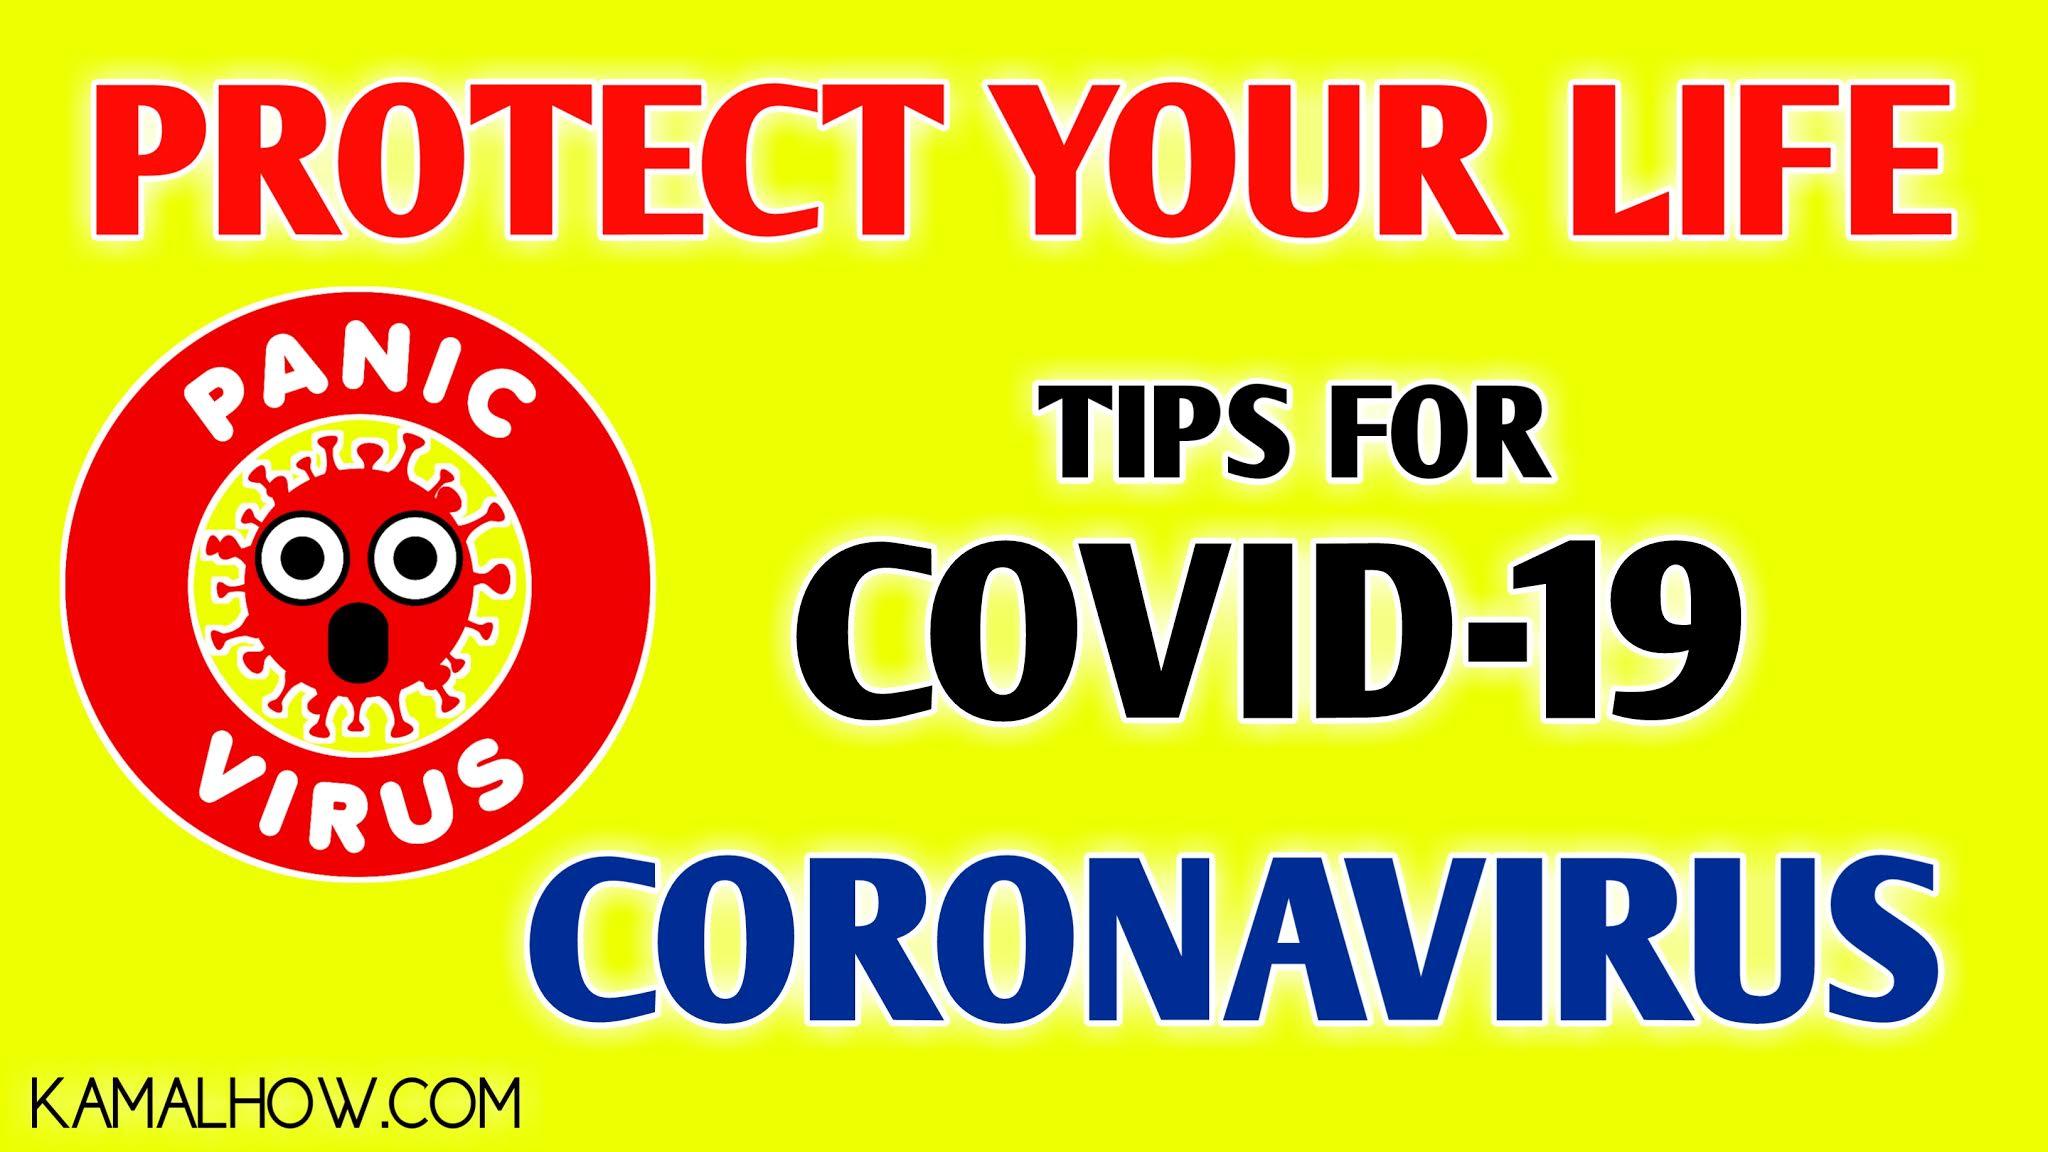 Prevention of Coronavirus Disease 2019 (COVID-19) | CDC, Coronavirus disease 2019 (COVID-19) - Diagnosis and treatment, coronavirus kya hai, कोरोना वायरस क्या है, कमल हाऊ, kamal how, kamalhow, china coronavirus, covid-19, tips for coronavirus, positive coronavirus india, italy coronavirus, america cironavirus, कोरोना lockdown, covid-19 alert who